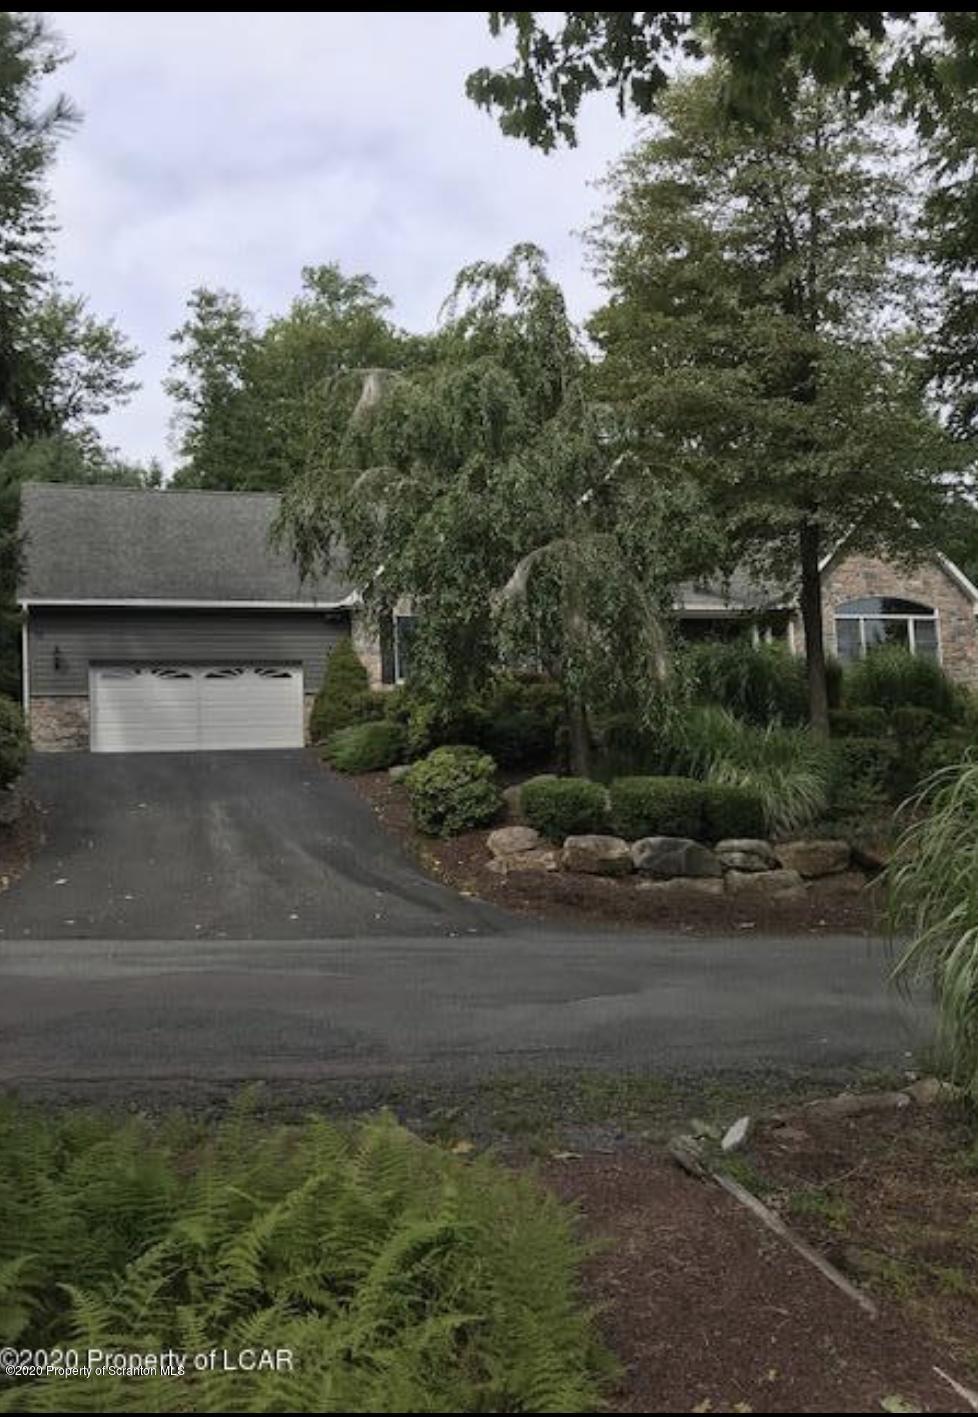 109 Lake Dr, Lake Harmony, Pennsylvania 18624, 4 Bedrooms Bedrooms, 12 Rooms Rooms,6 BathroomsBathrooms,Single Family,For Sale,Lake,20-4310